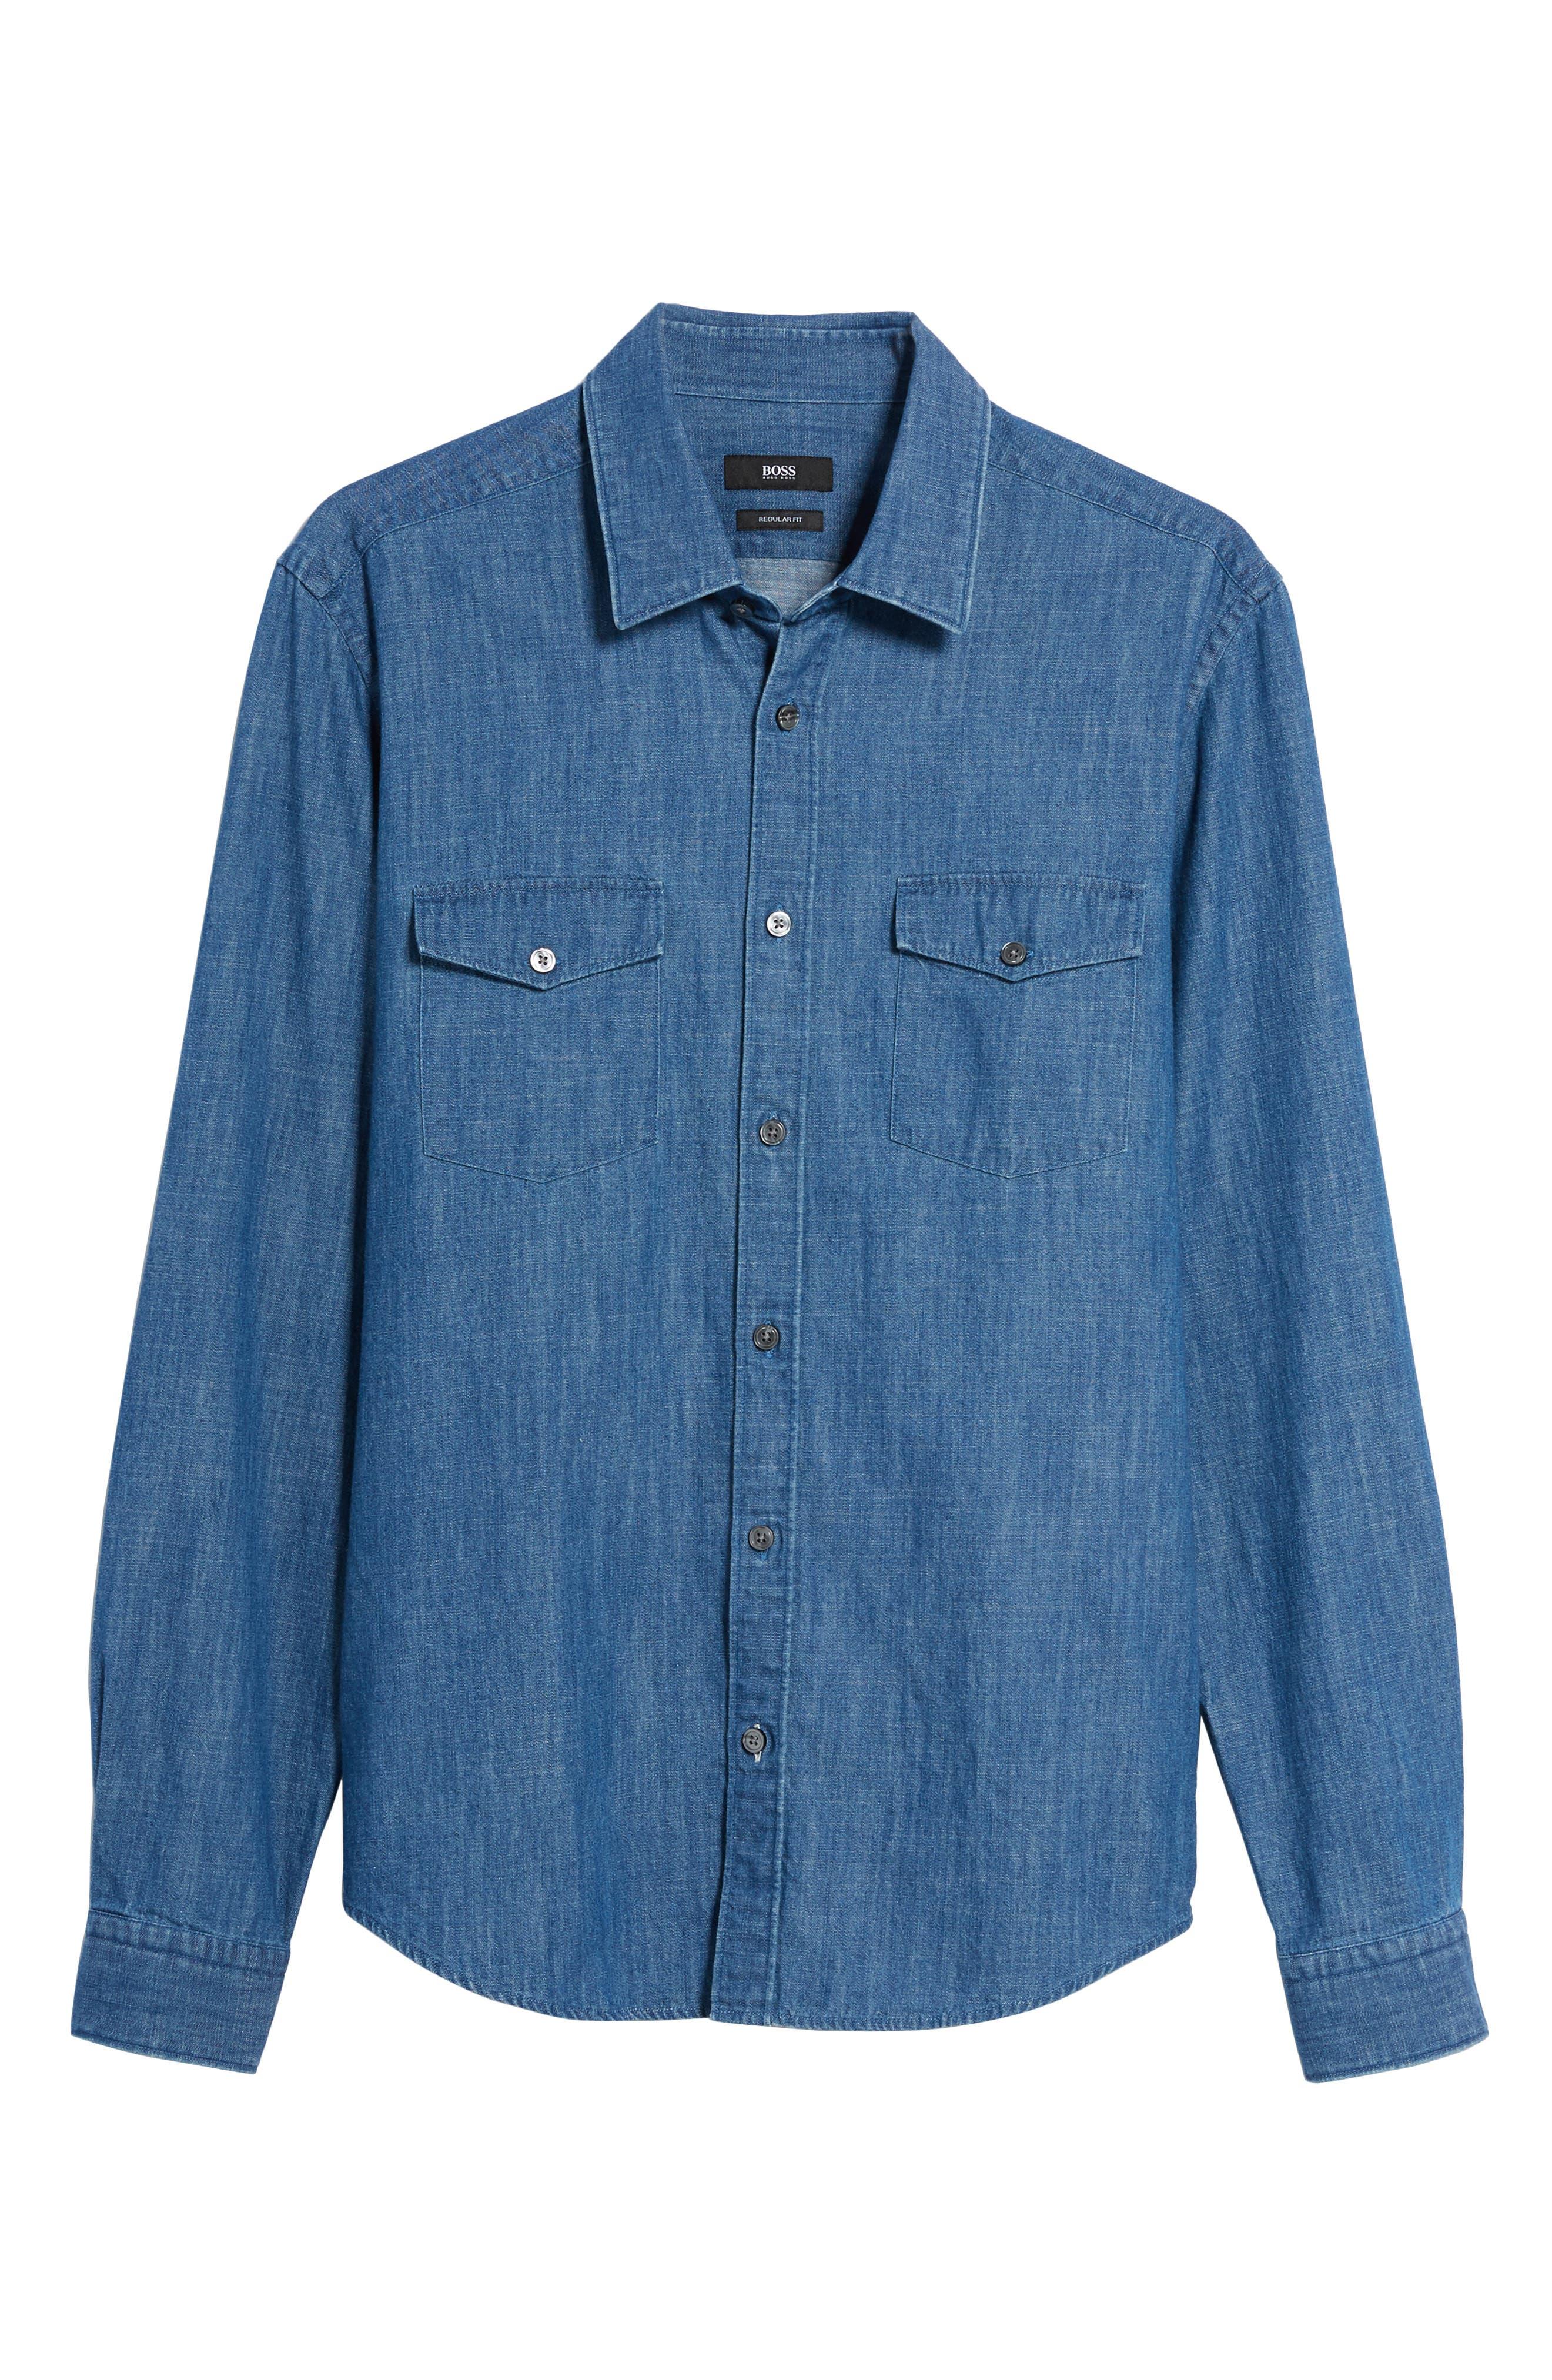 Lance Regular Fit Two-Pocket Denim Sport Shirt,                             Alternate thumbnail 5, color,                             Blue